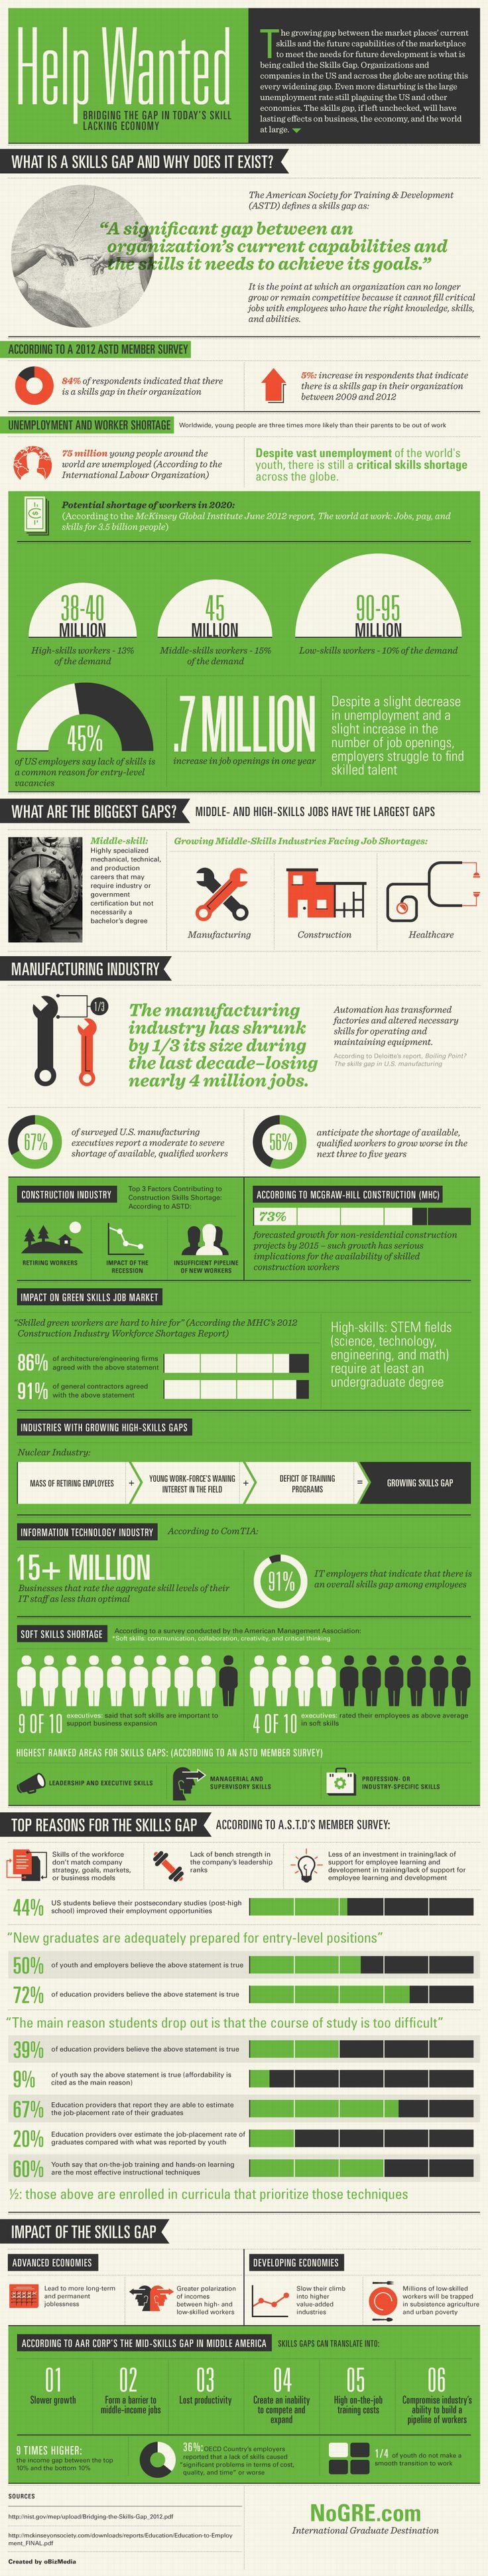 The Skills Gap Infographic - http://elearninginfographics.com/skills-gap-infographic/